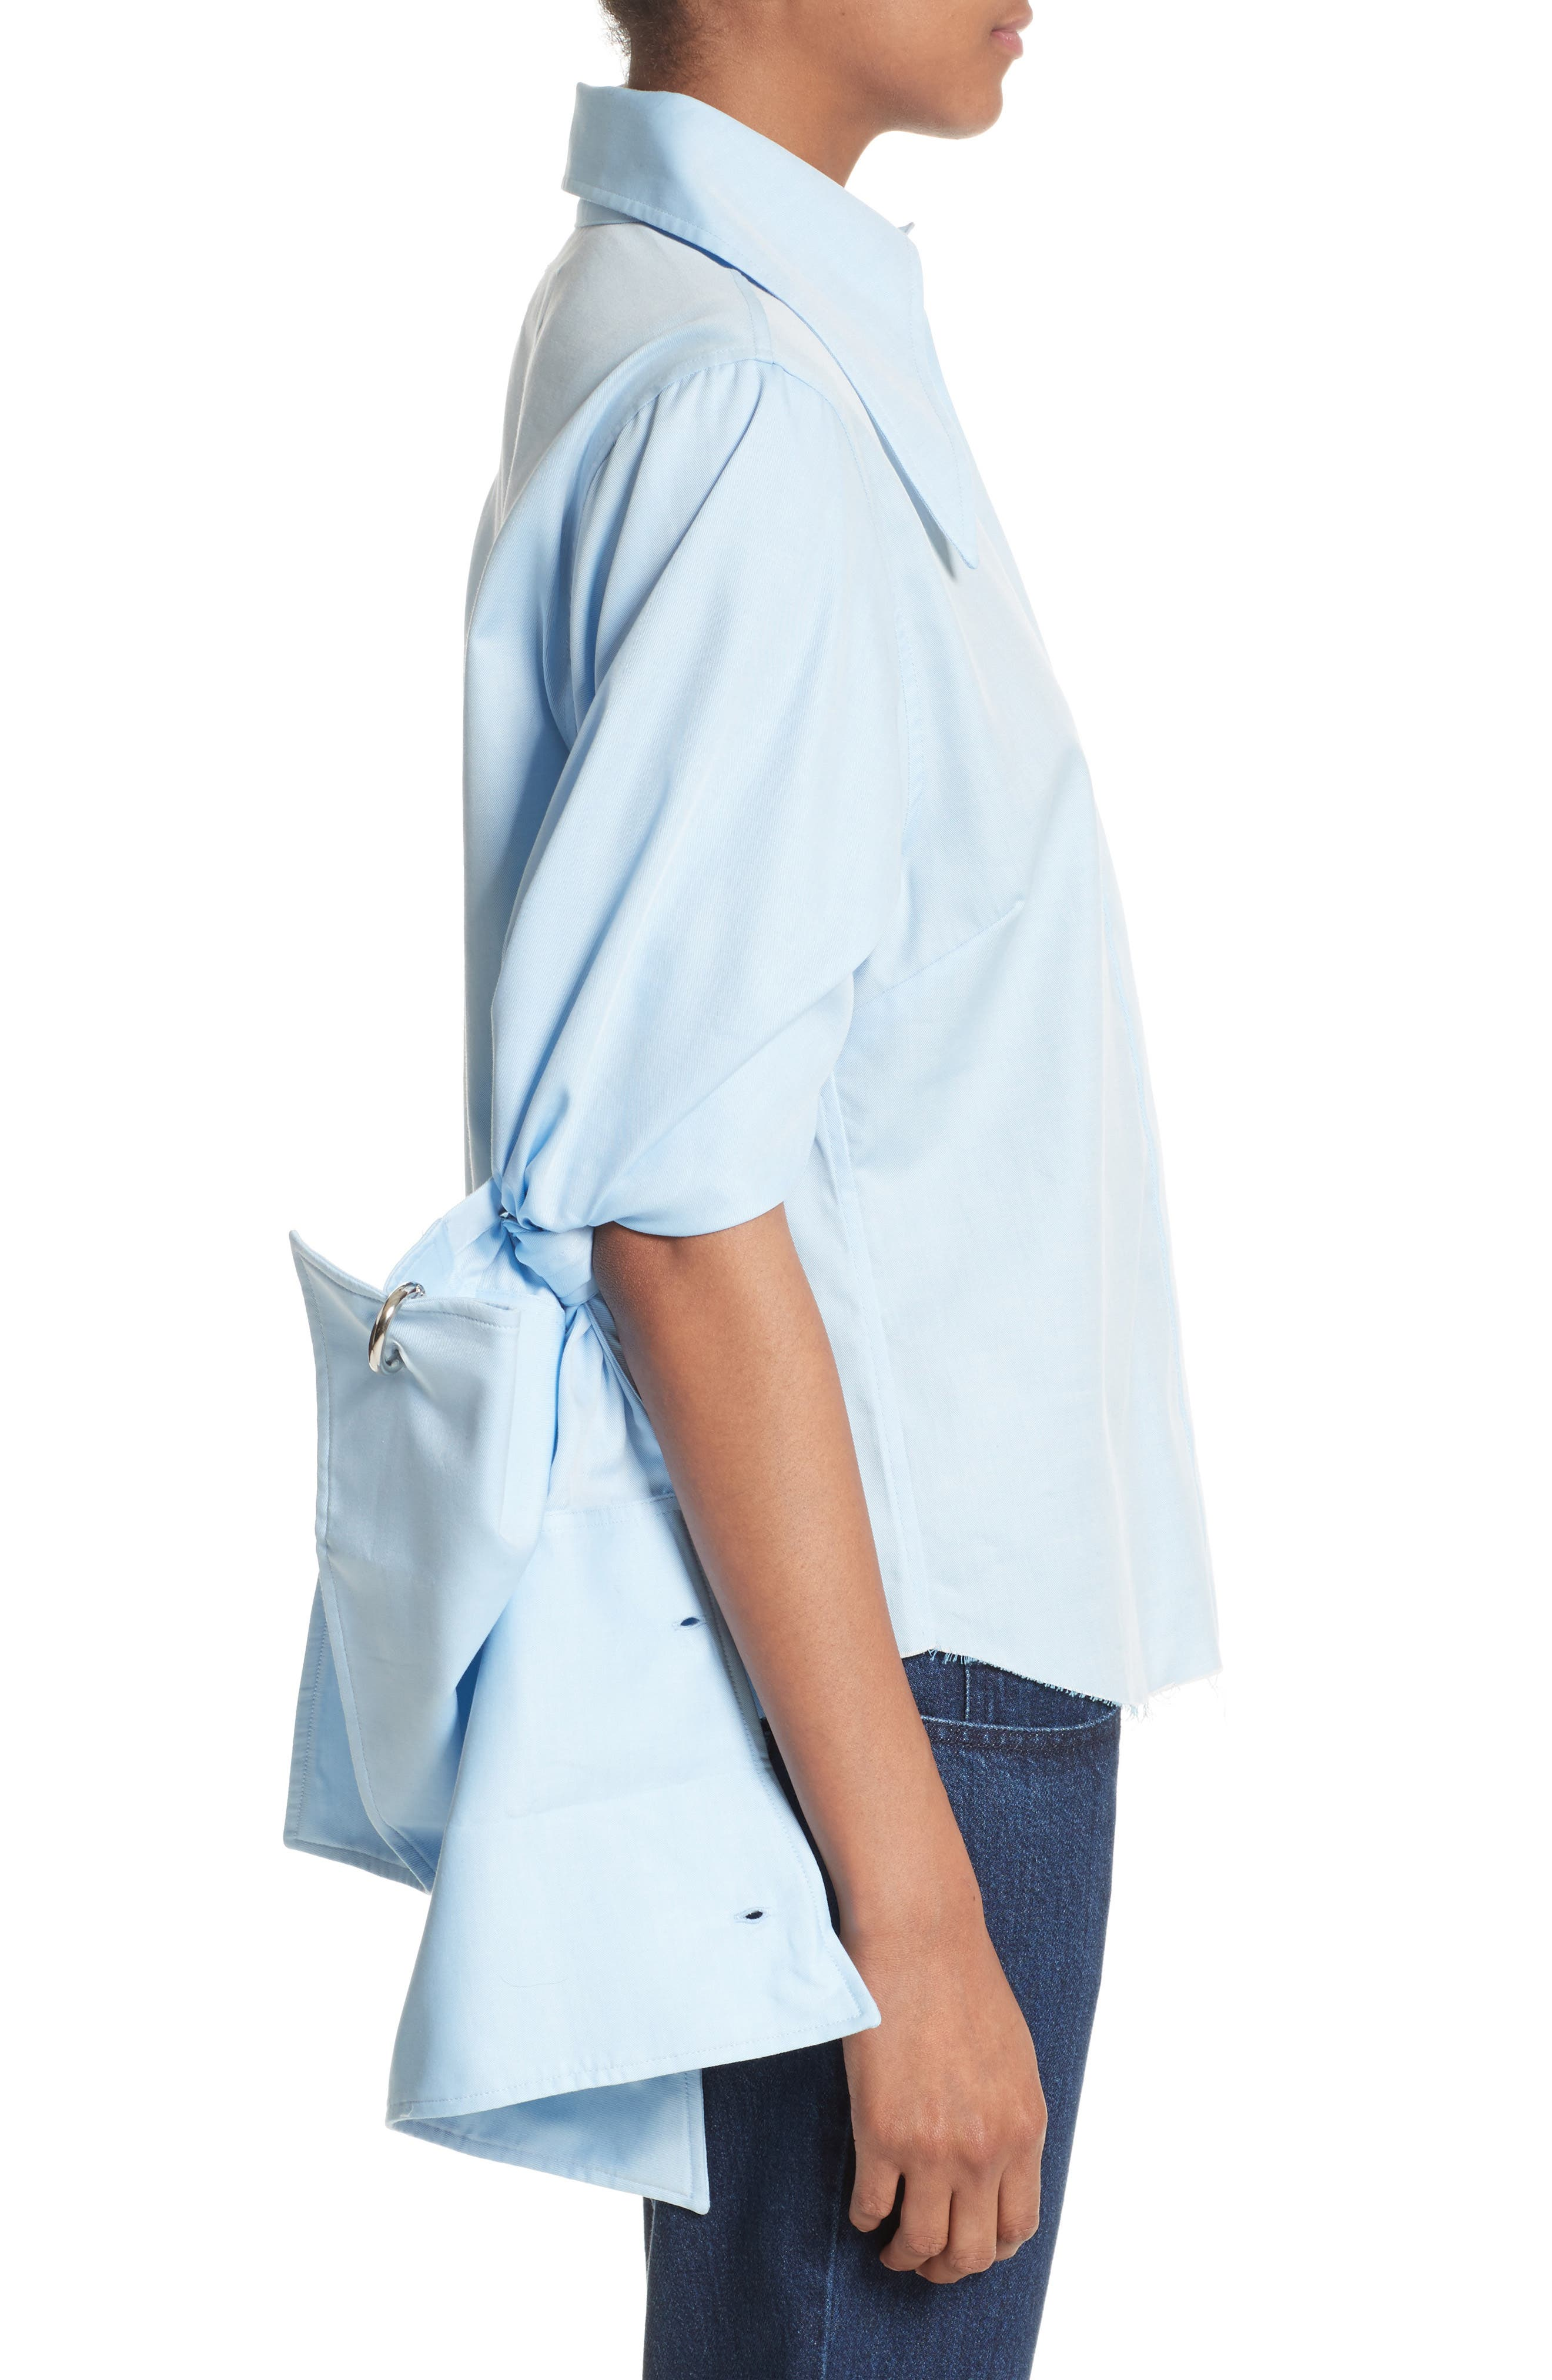 Marques'Almeida Double Sleeve Blouse,                             Alternate thumbnail 3, color,                             Light Blue